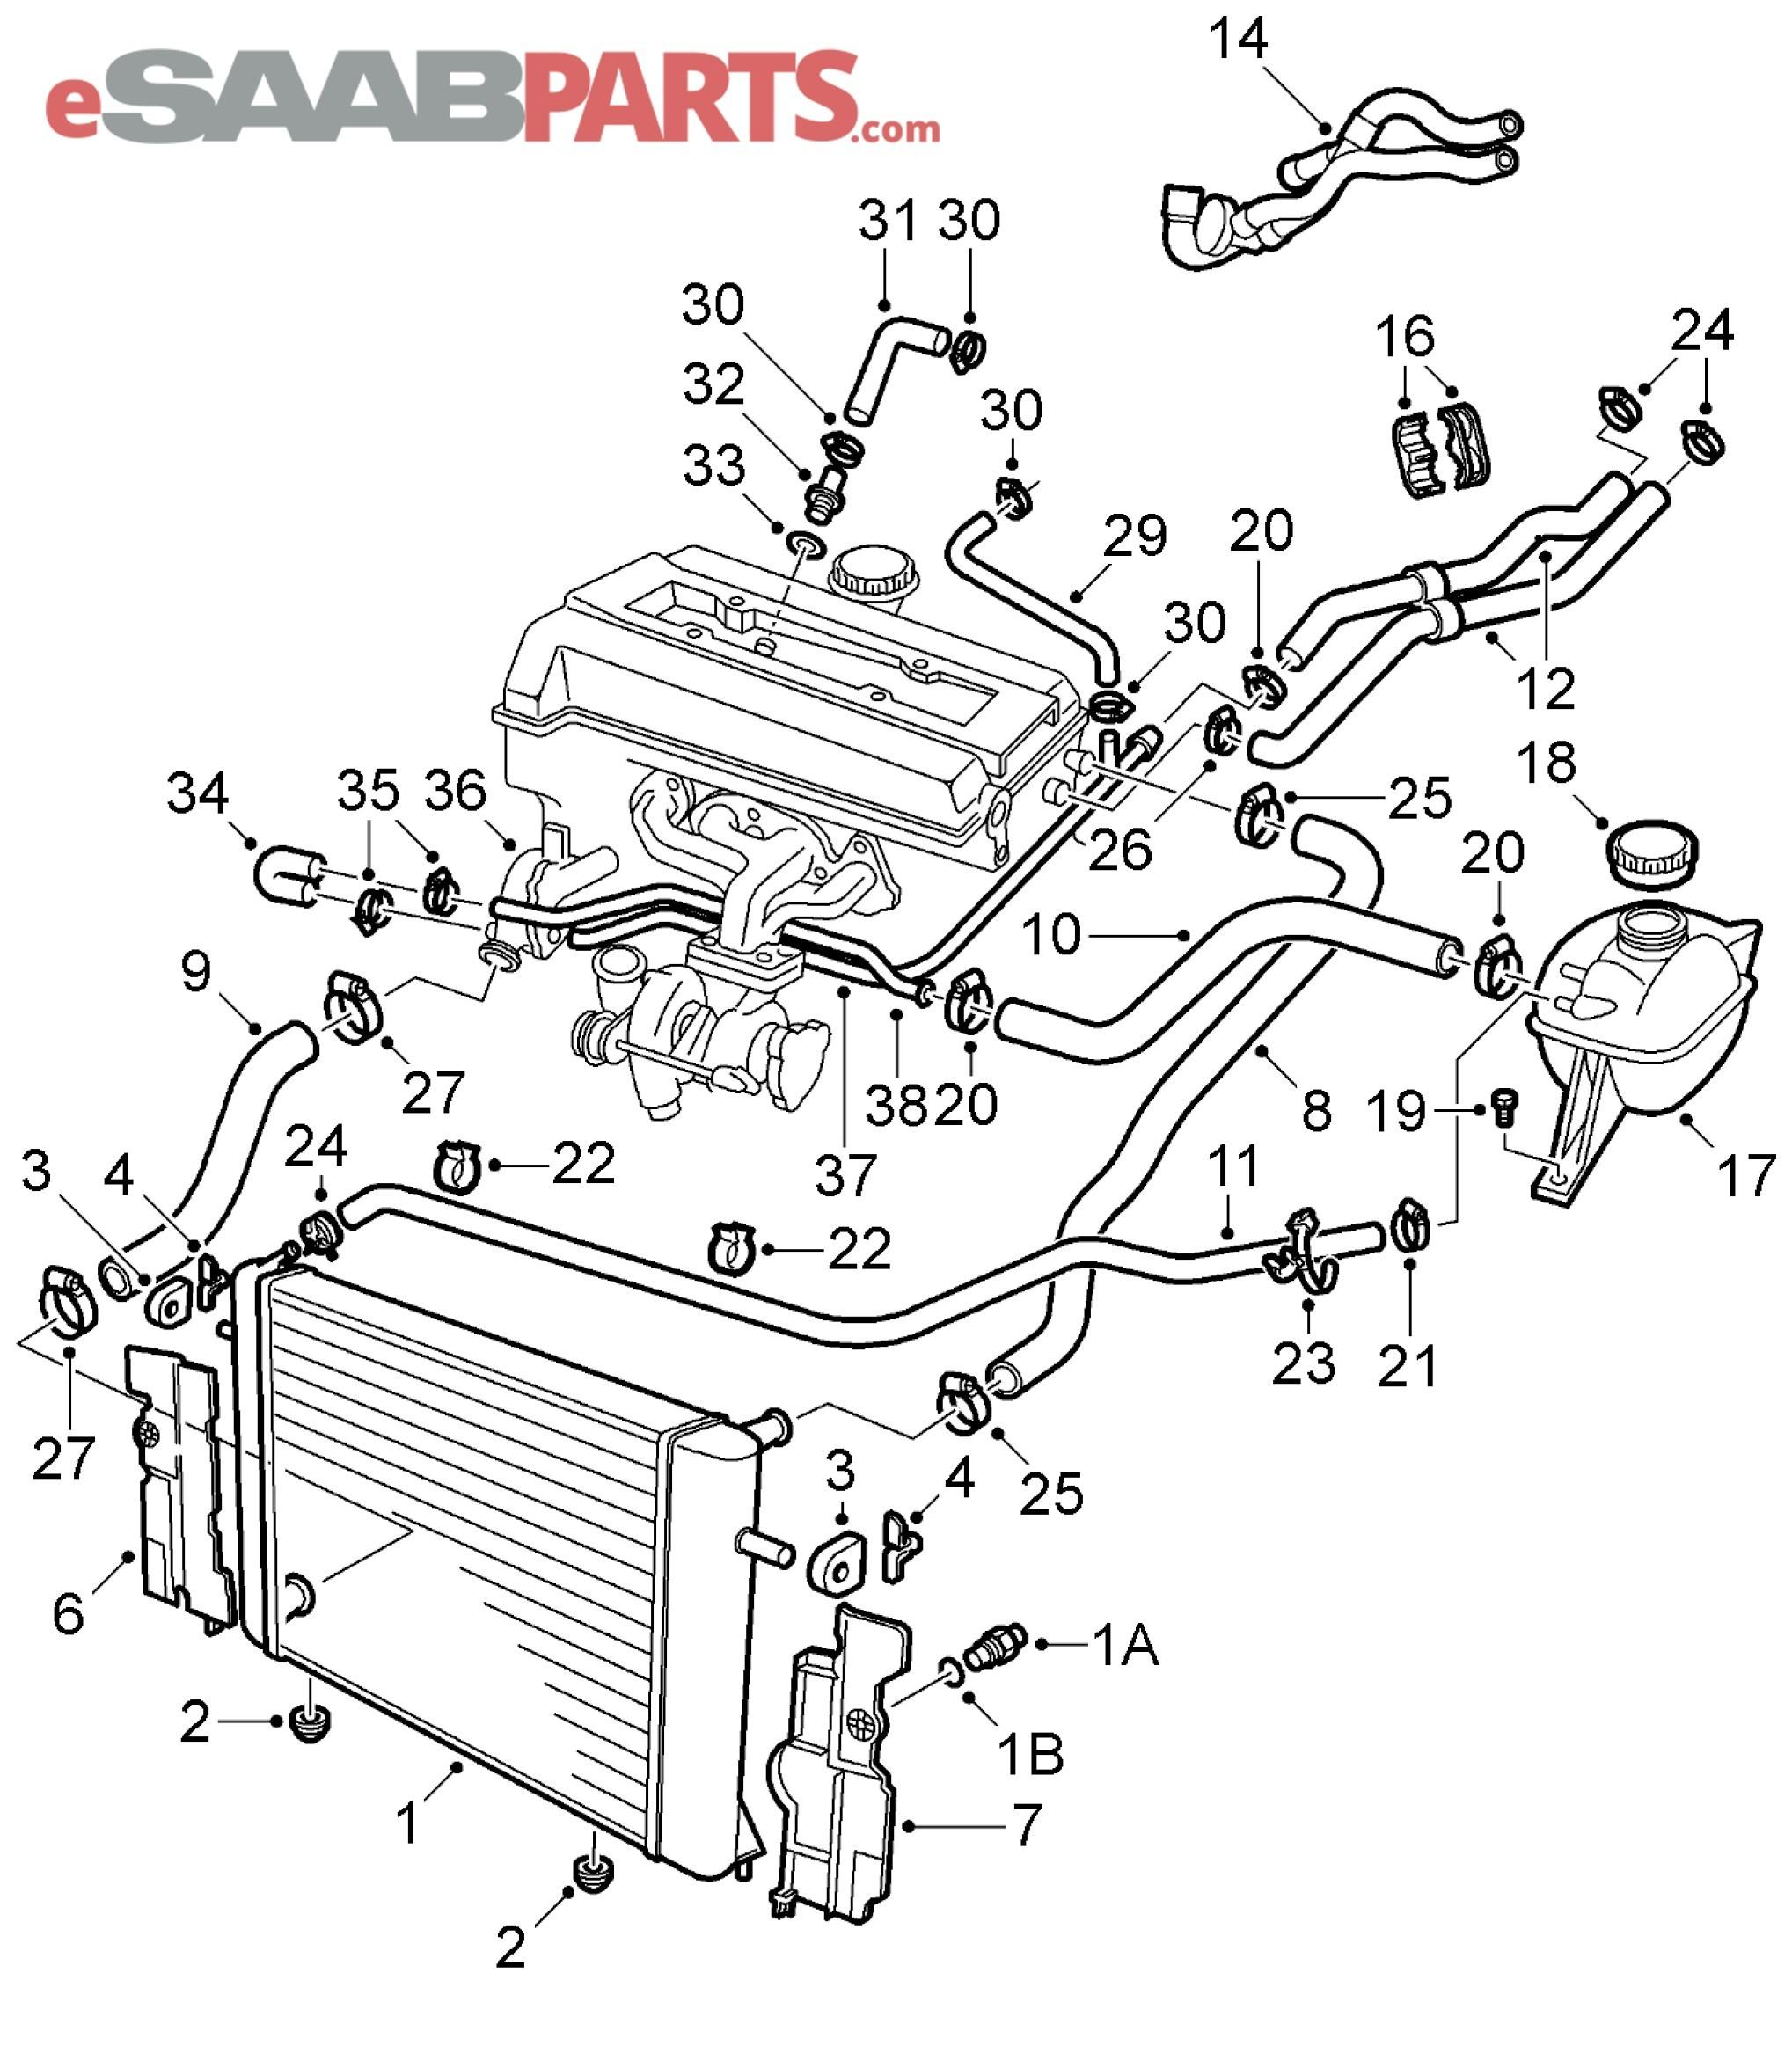 Saab 9 5 Engine Diagram 2 Saab 99 Wiring Diagram Layout Wiring Diagrams • Of Saab 9 5 Engine Diagram 2